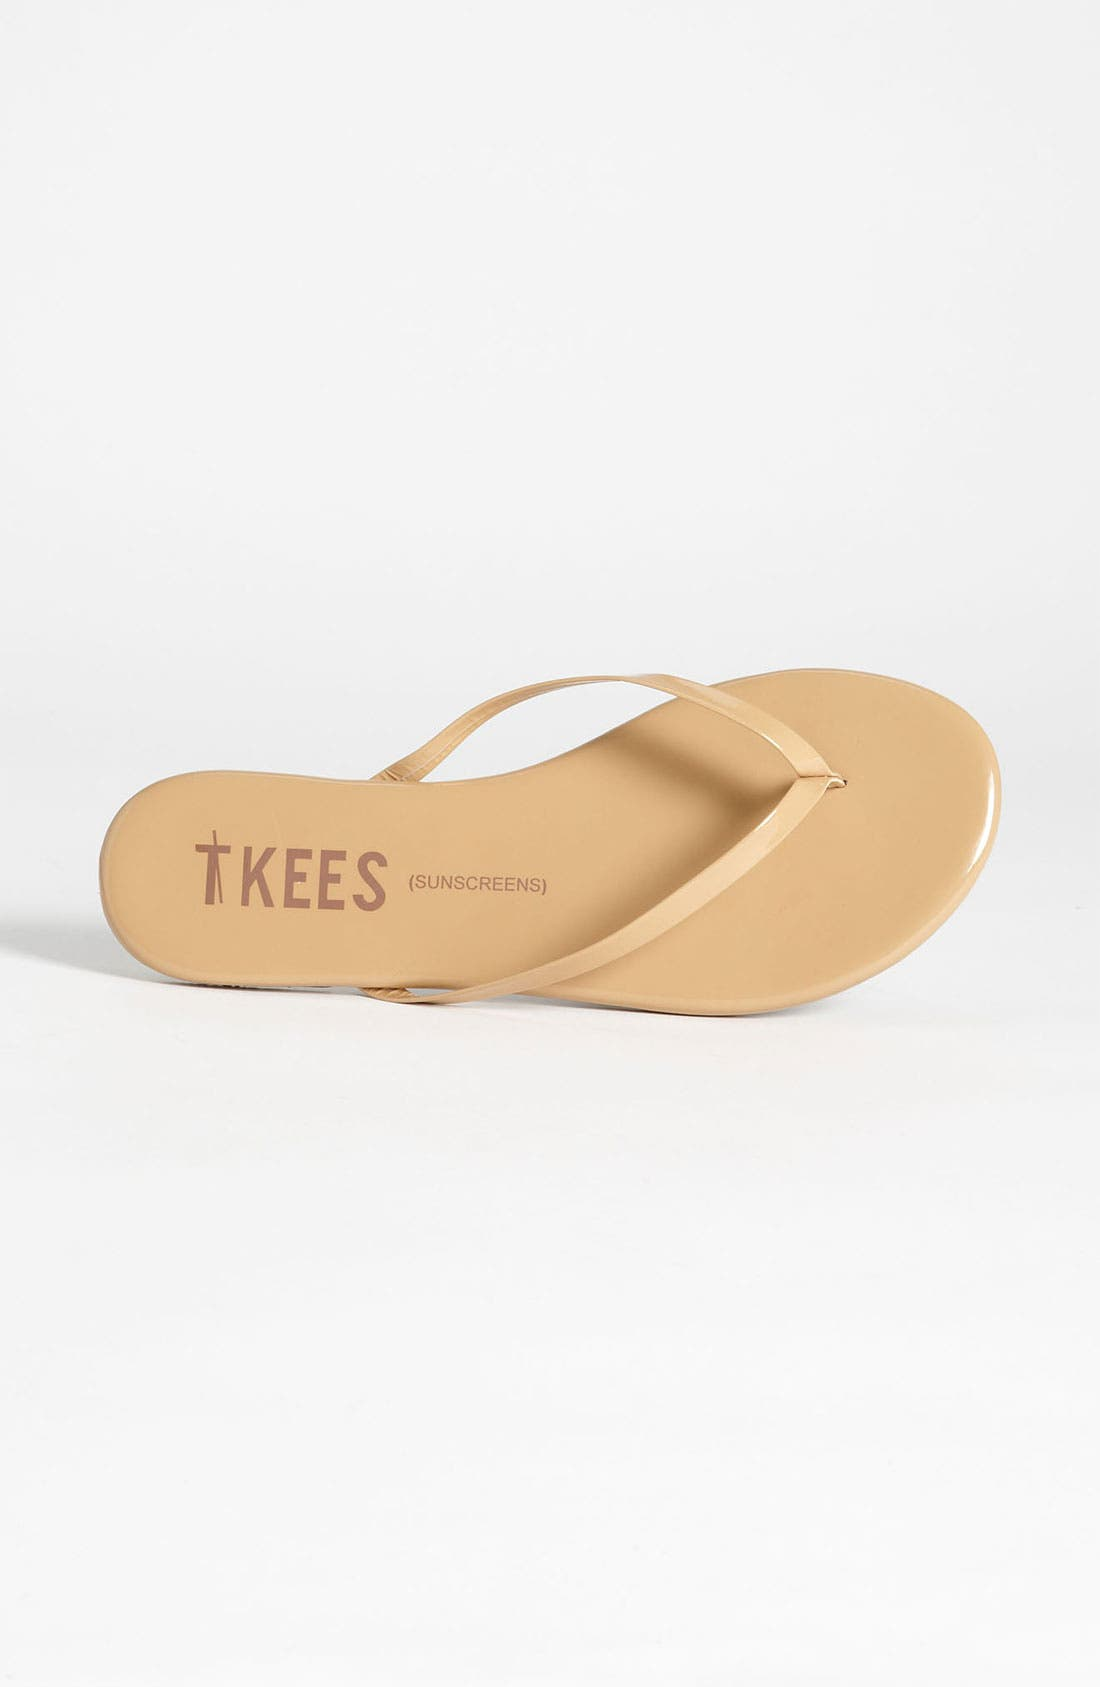 TKEES, 'Sunscreens' Flip Flop, Alternate thumbnail 3, color, 250